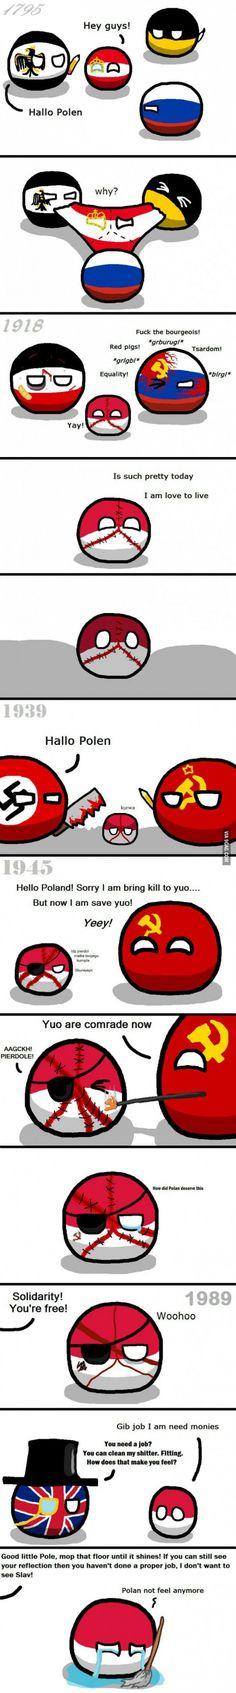 Poor Poland